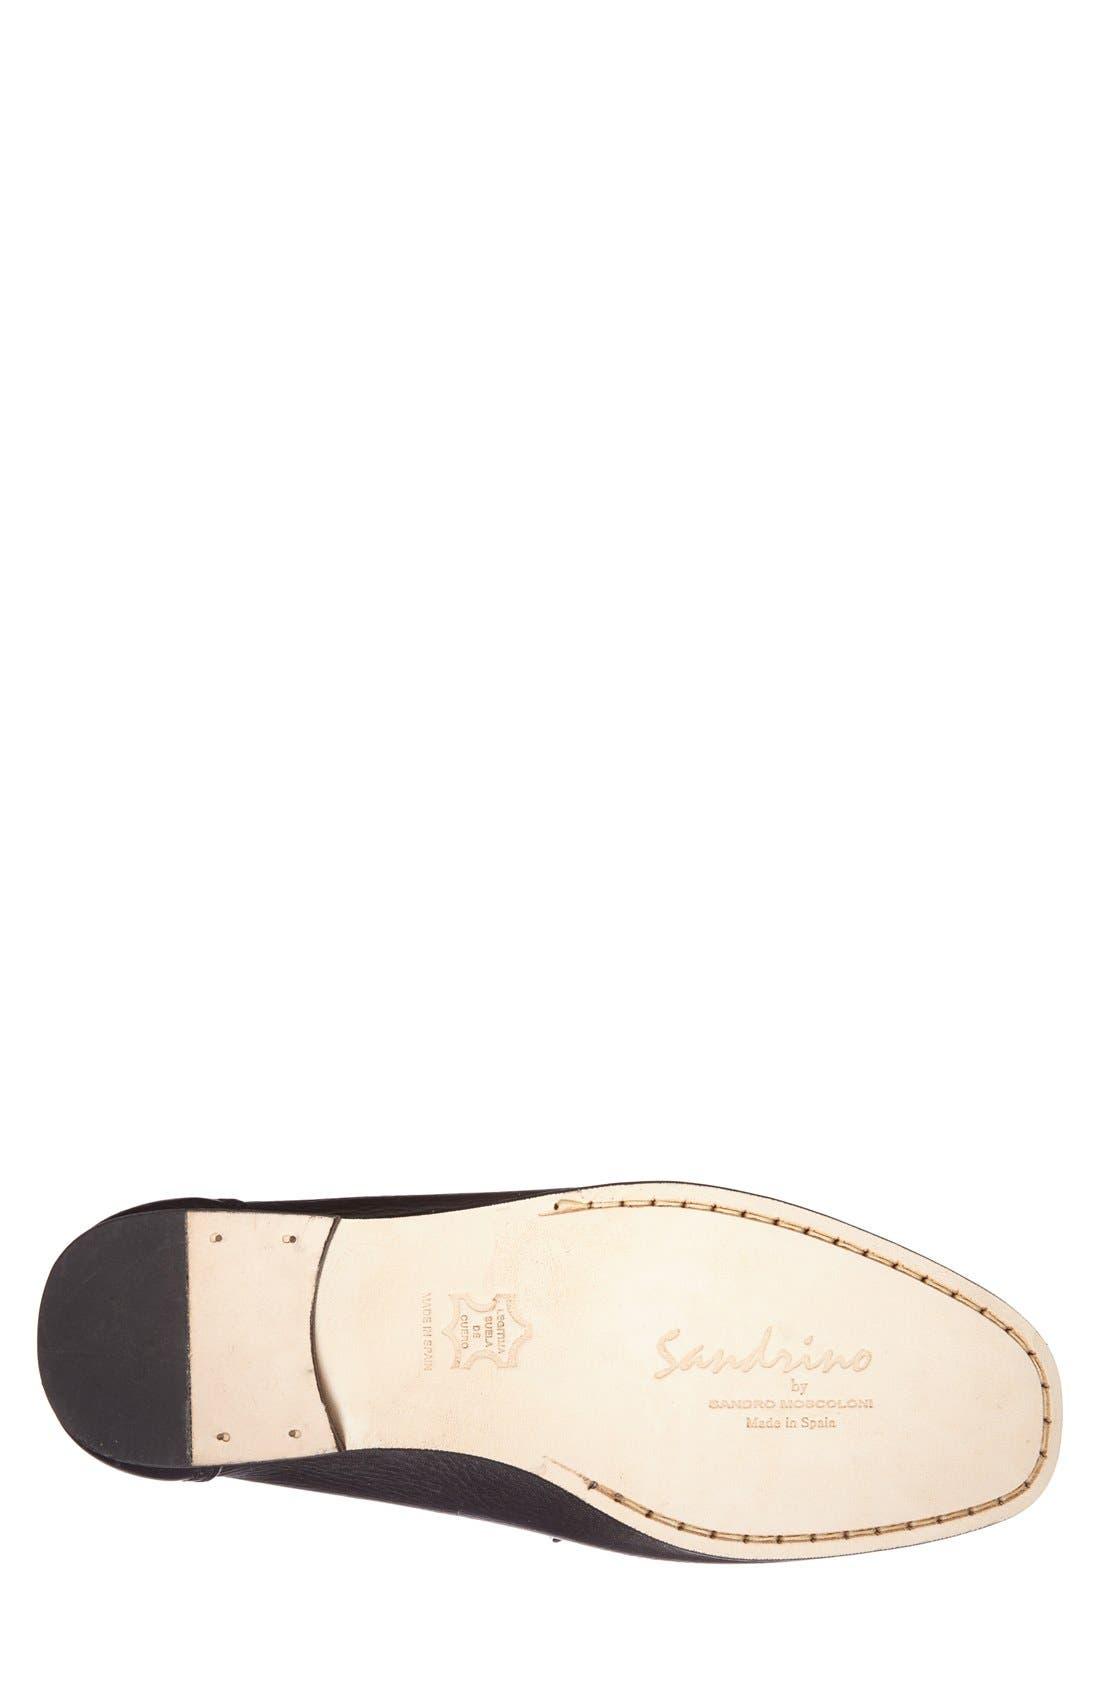 Alternate Image 2  - Sandro Moscoloni 'San Remo' Leather Bit Loafer (Men)